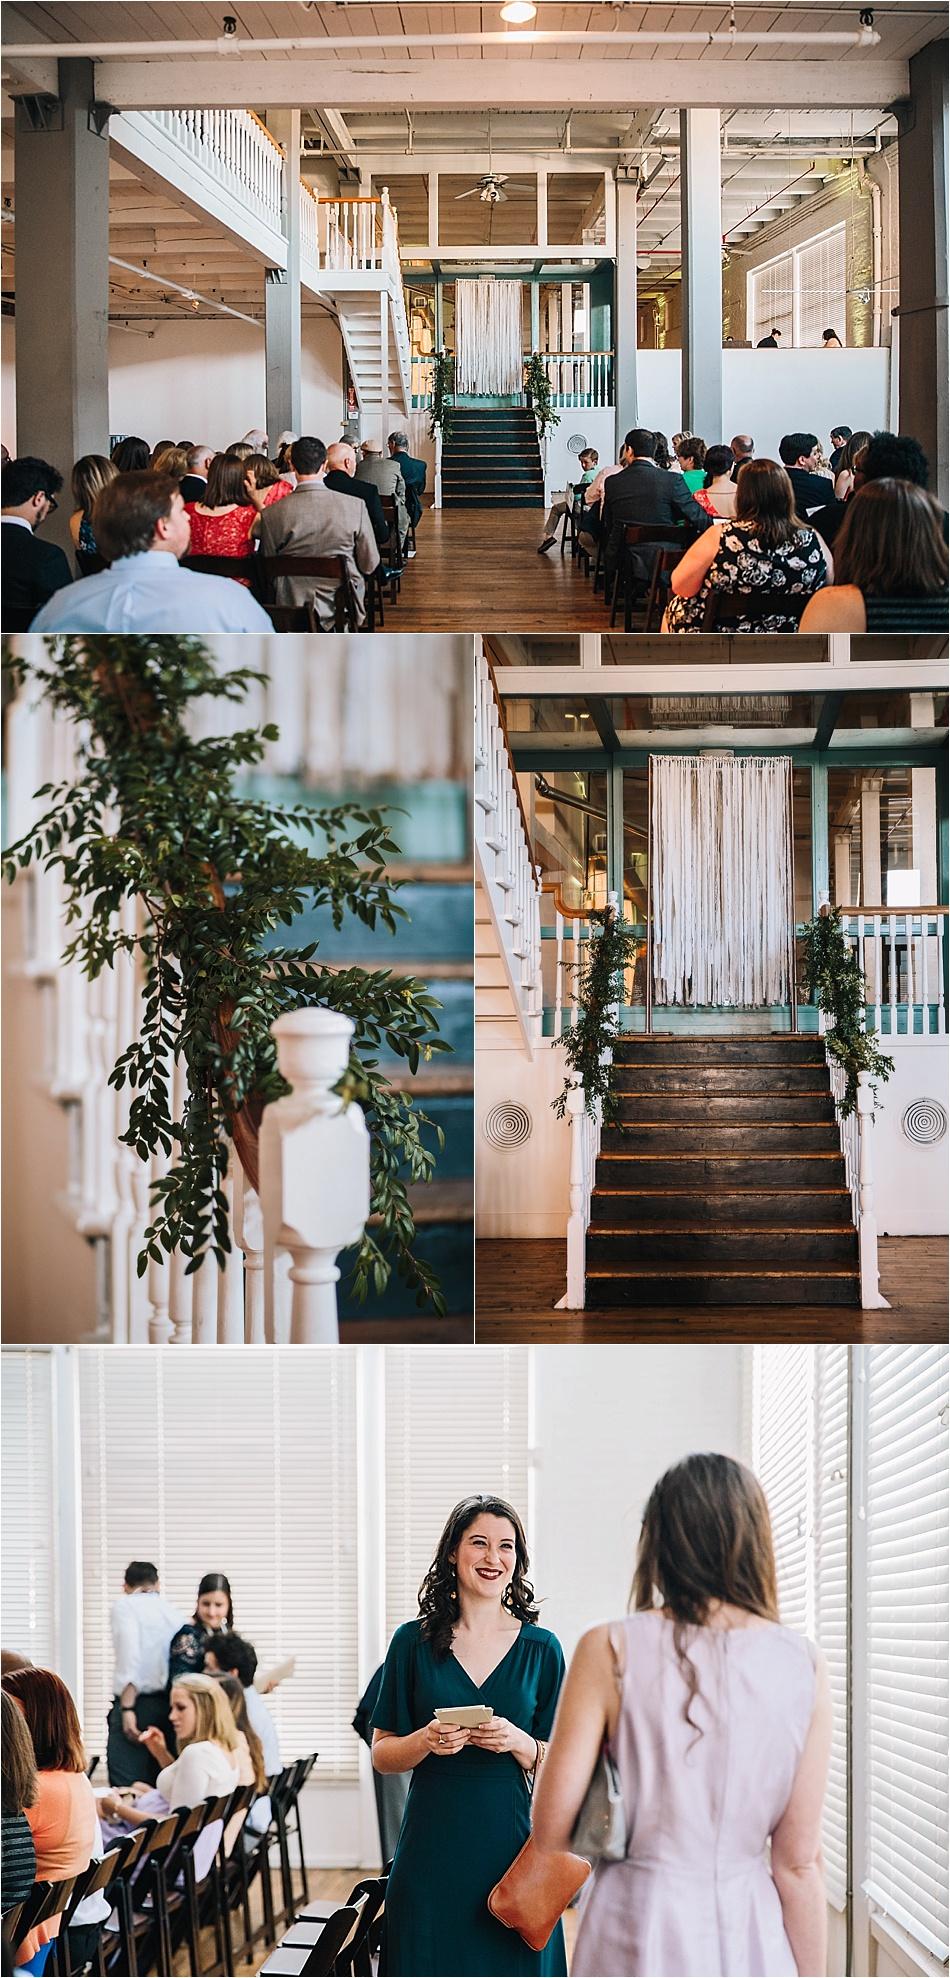 CK-Photo-Nashville-Wedding-Photographer-_0022.jpg